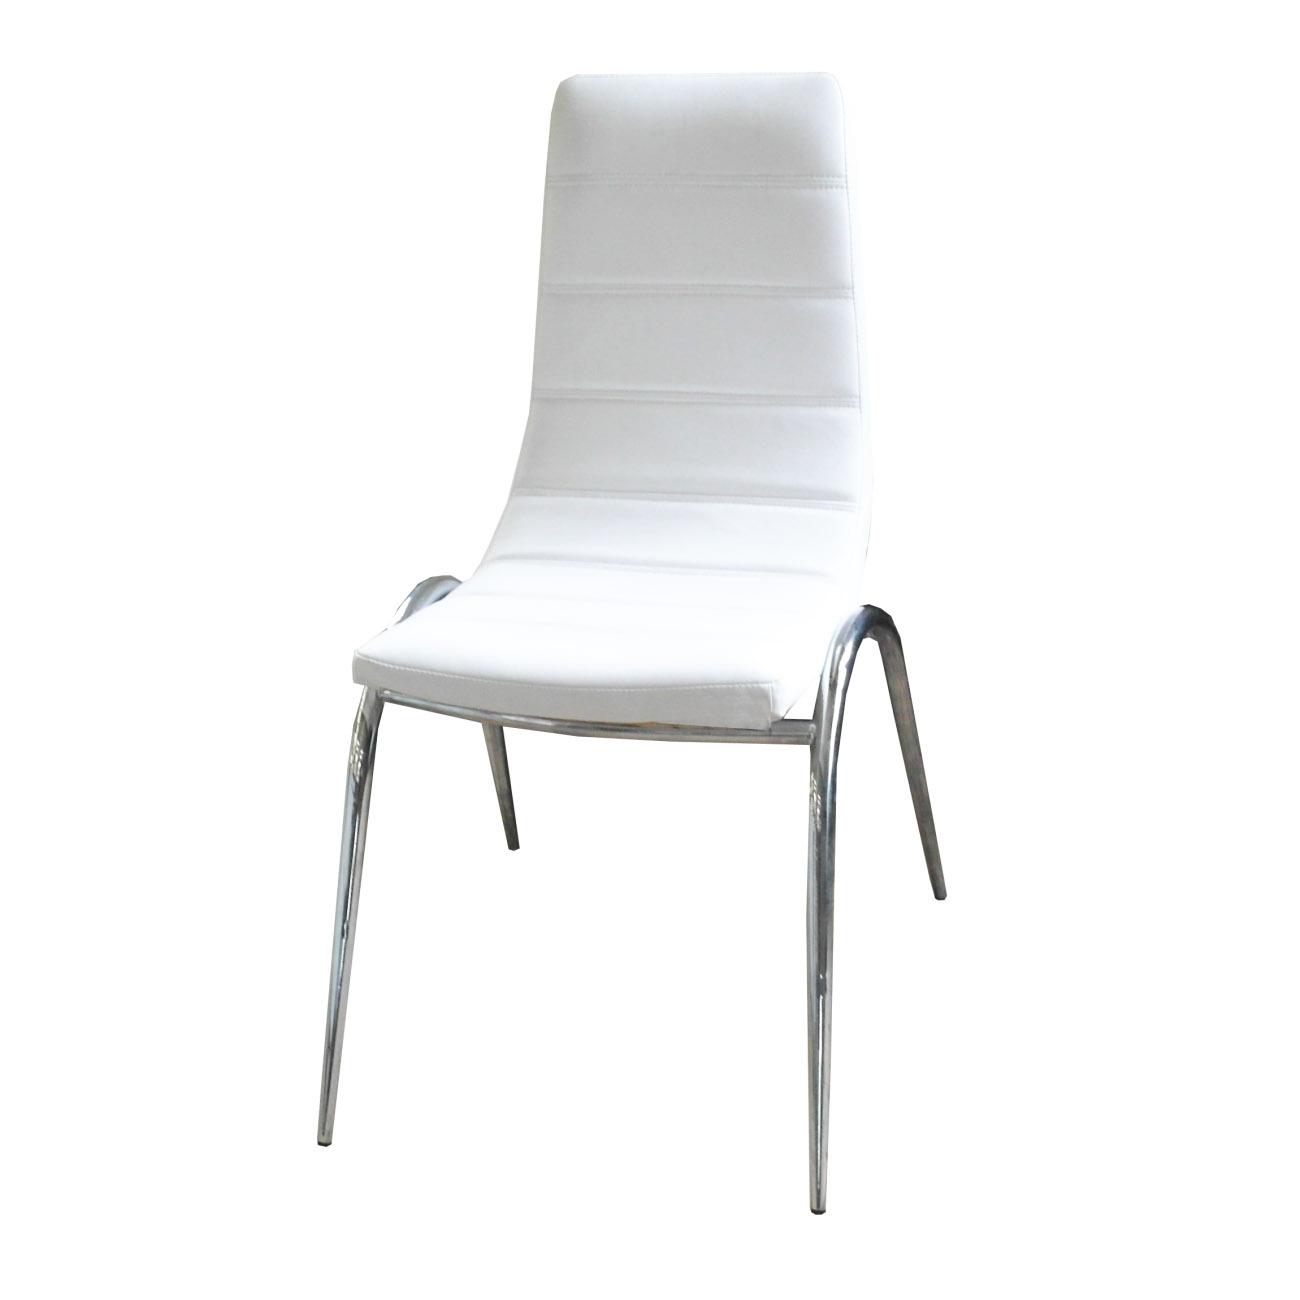 стул Бомбей